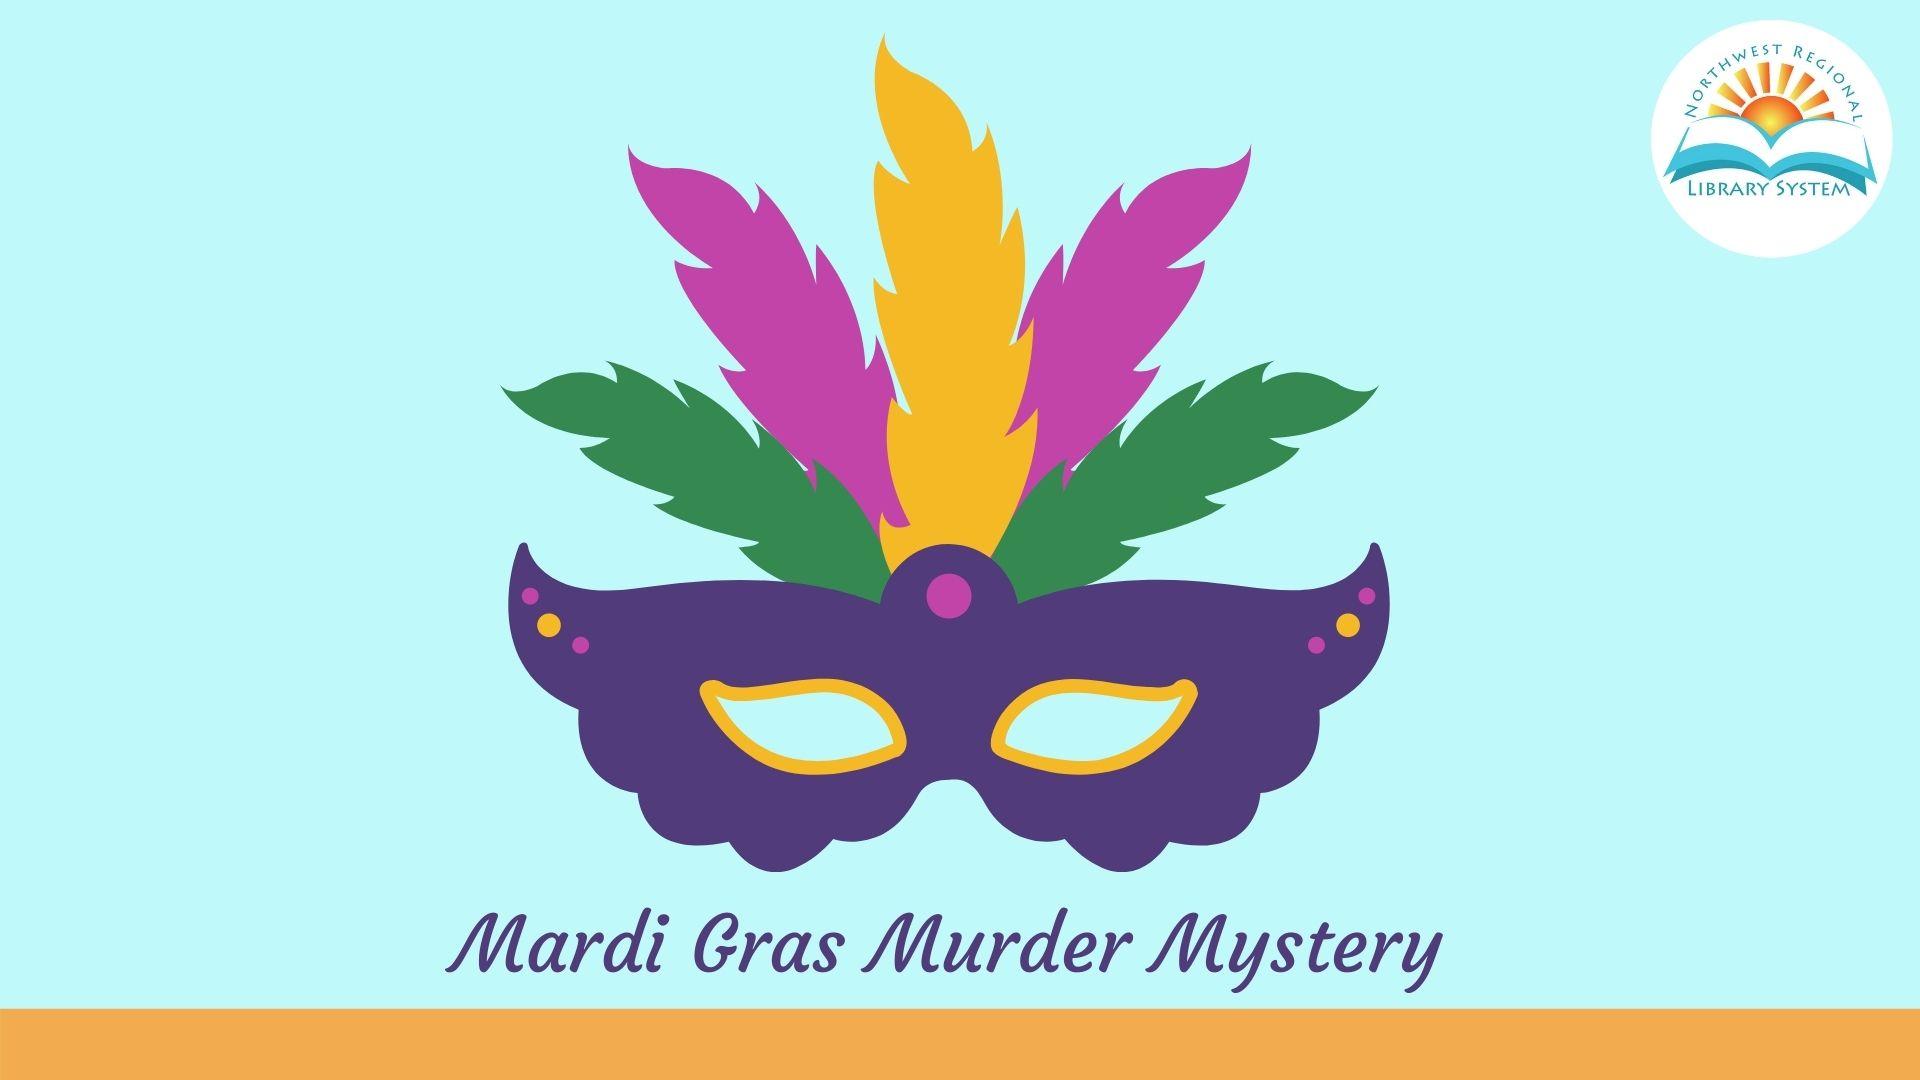 Mardi Gras Murder Mystery